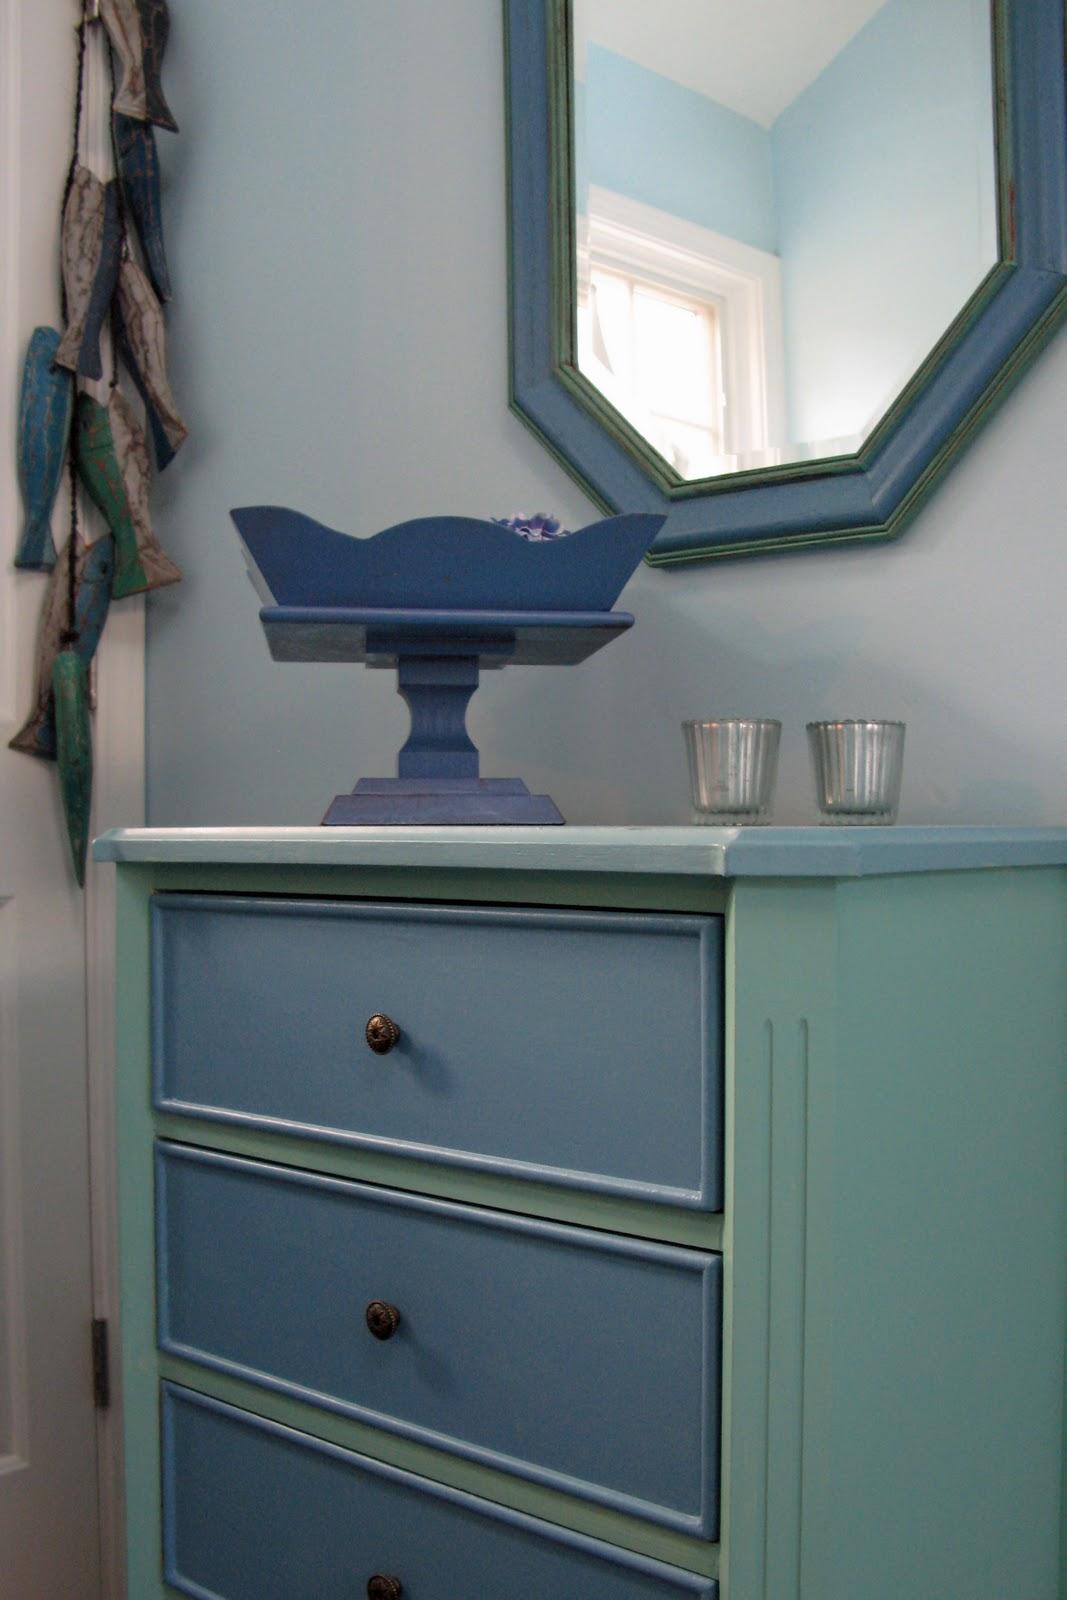 Drawer Dresser With Mirror The Mirror Above The Dresser